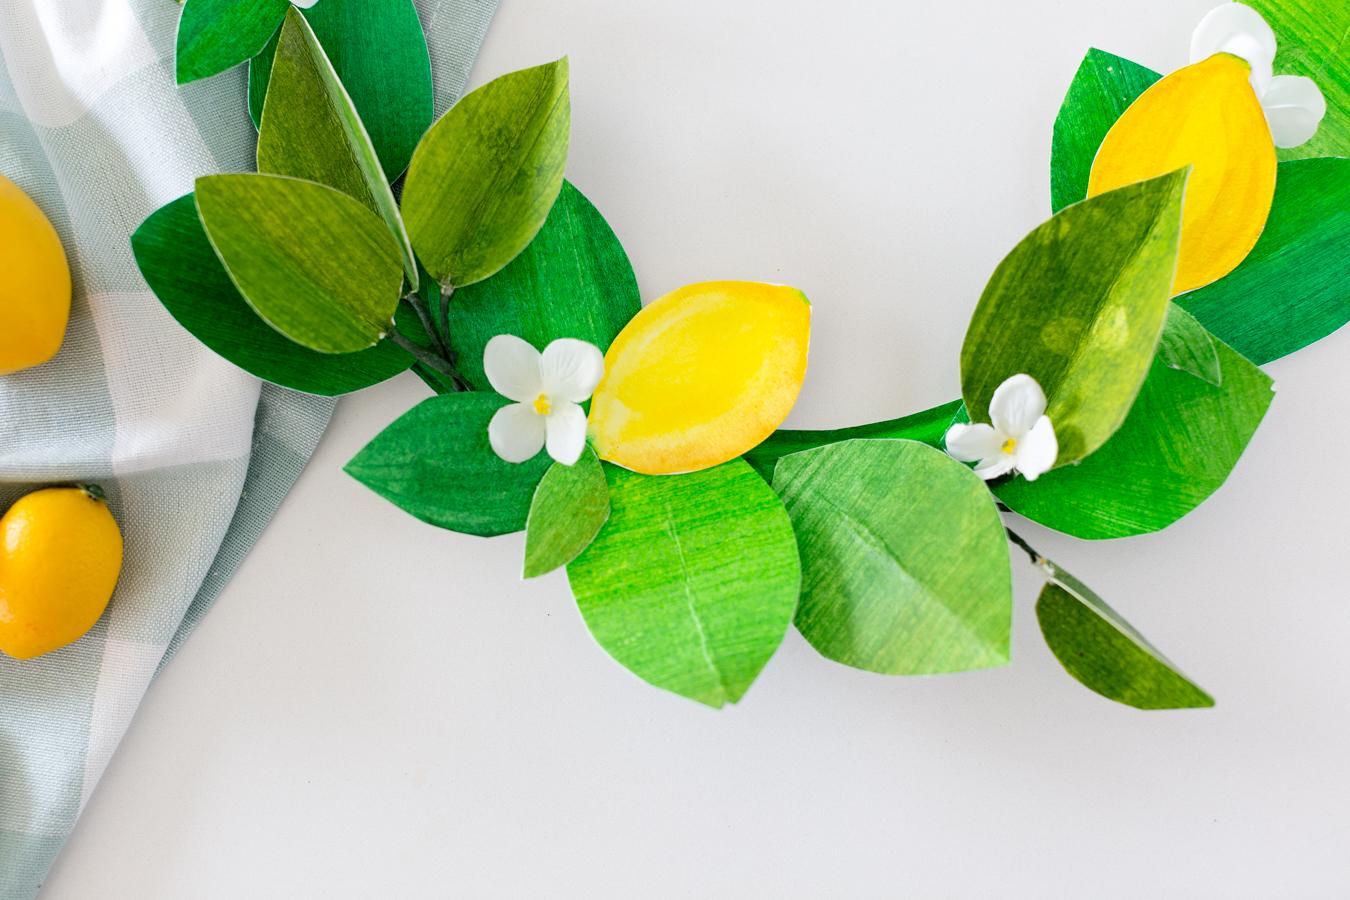 paper lemon wreath diy craftberrybush-24